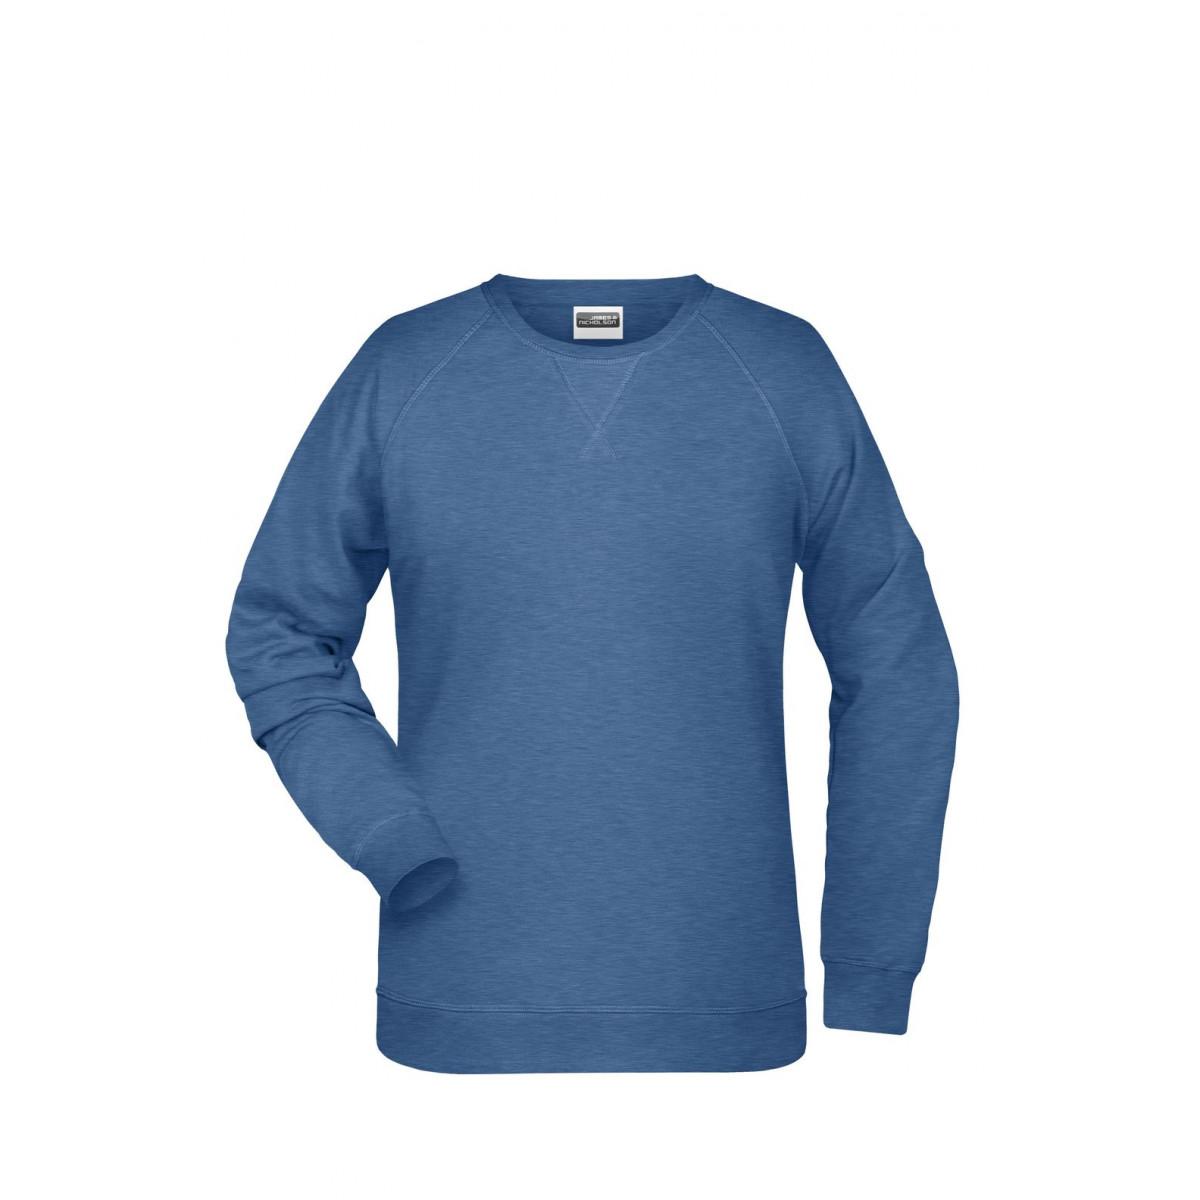 Толстовка женская 8021 Ladies Sweat - Светло-синий меланж